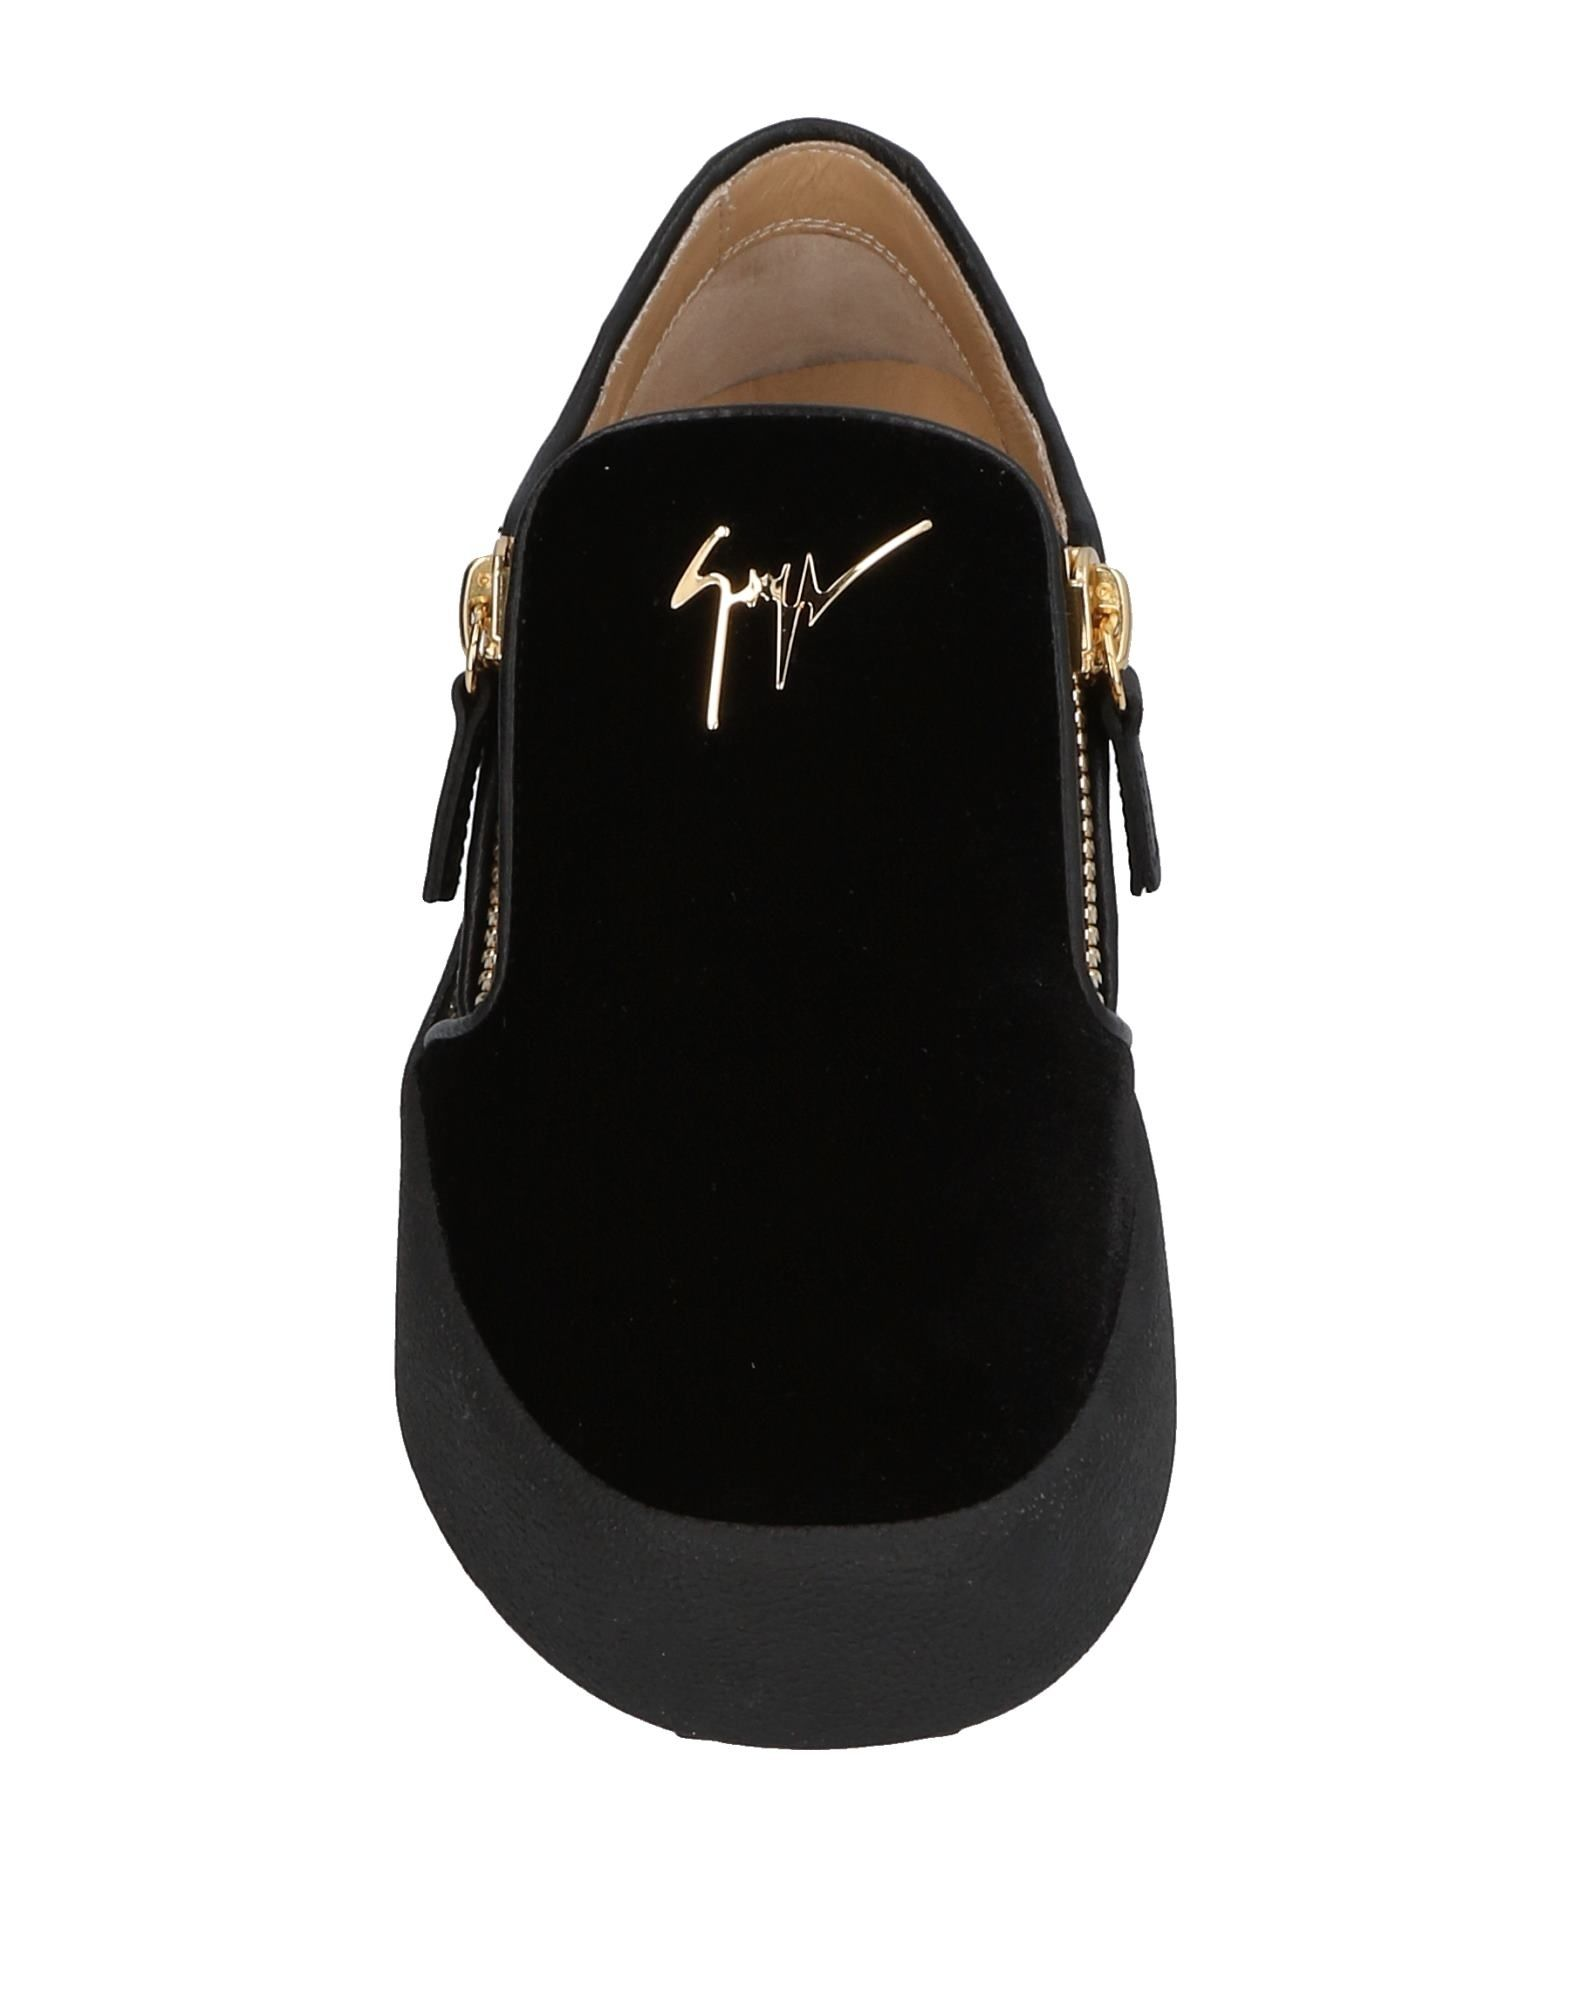 Giuseppe Zanotti Sneakers Damen  gut 11445953XBGünstige gut  aussehende Schuhe 20ed84